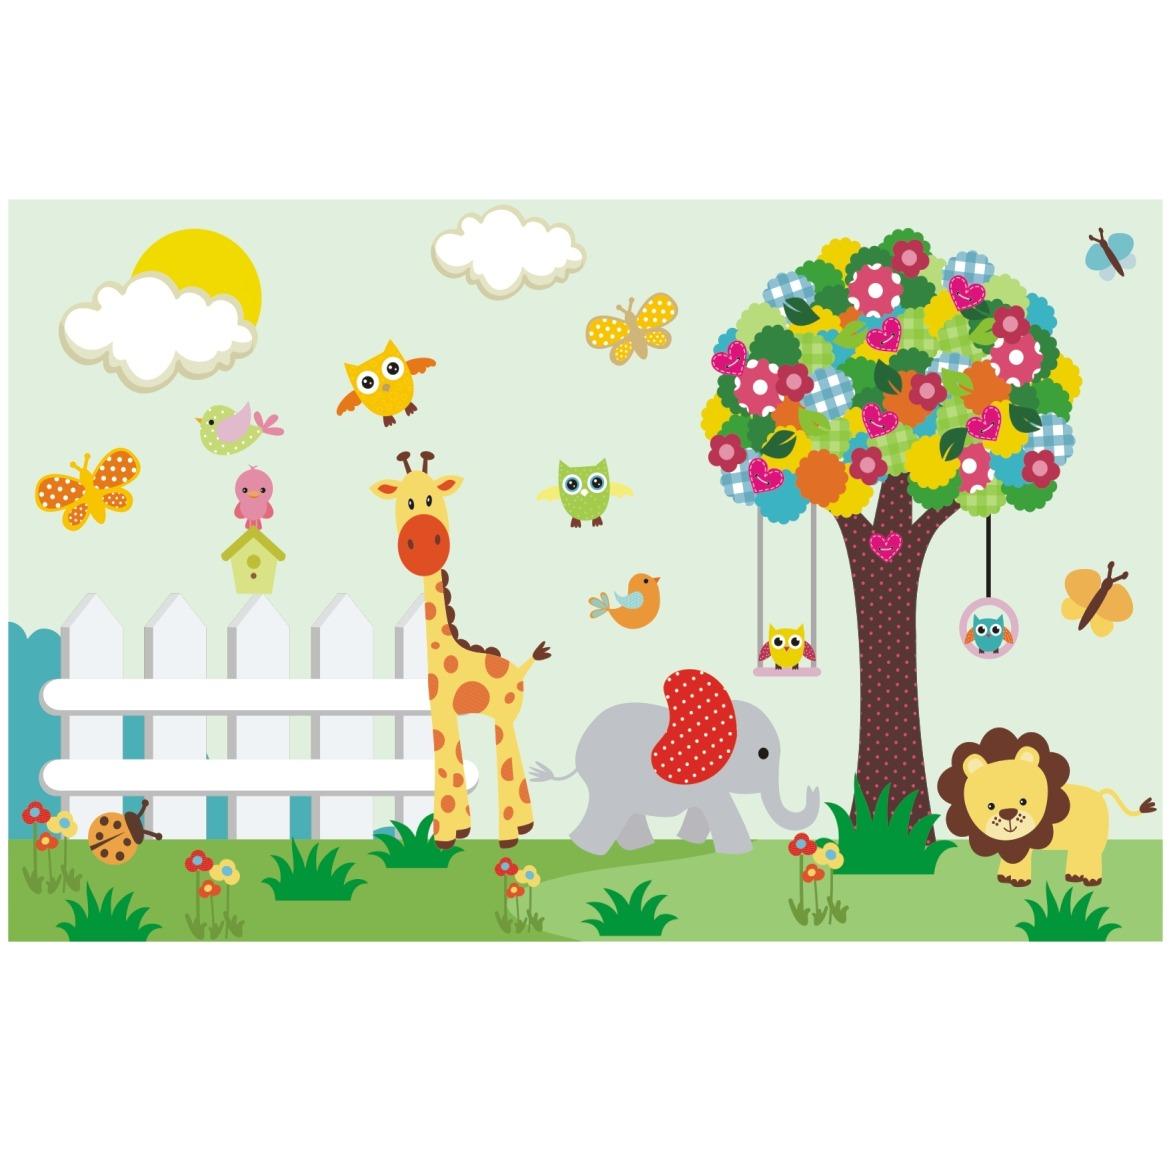 Papel parede infantil zoo safari adesivo animais mural m05 - Mural pared infantil ...